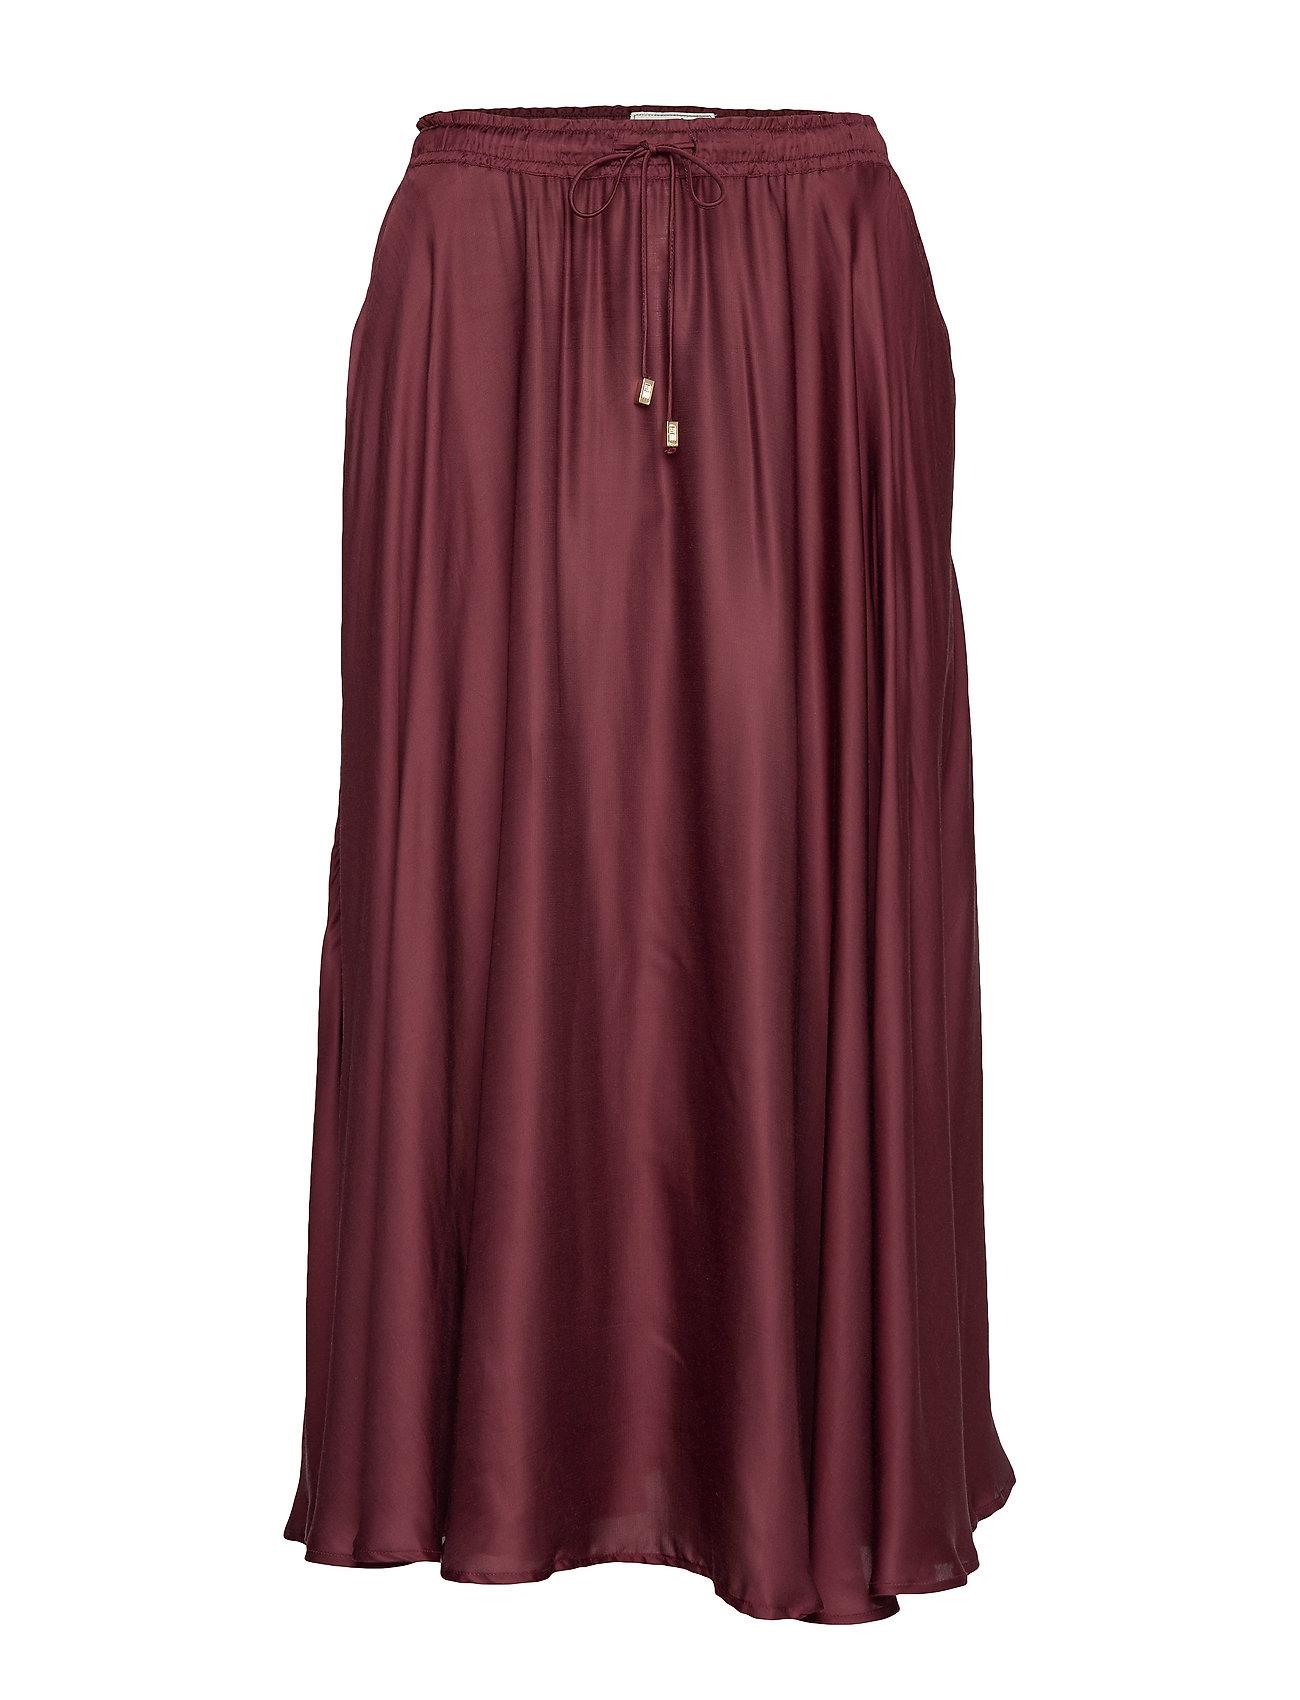 Lexington Clothing Della Satin Skirt - DARK RED